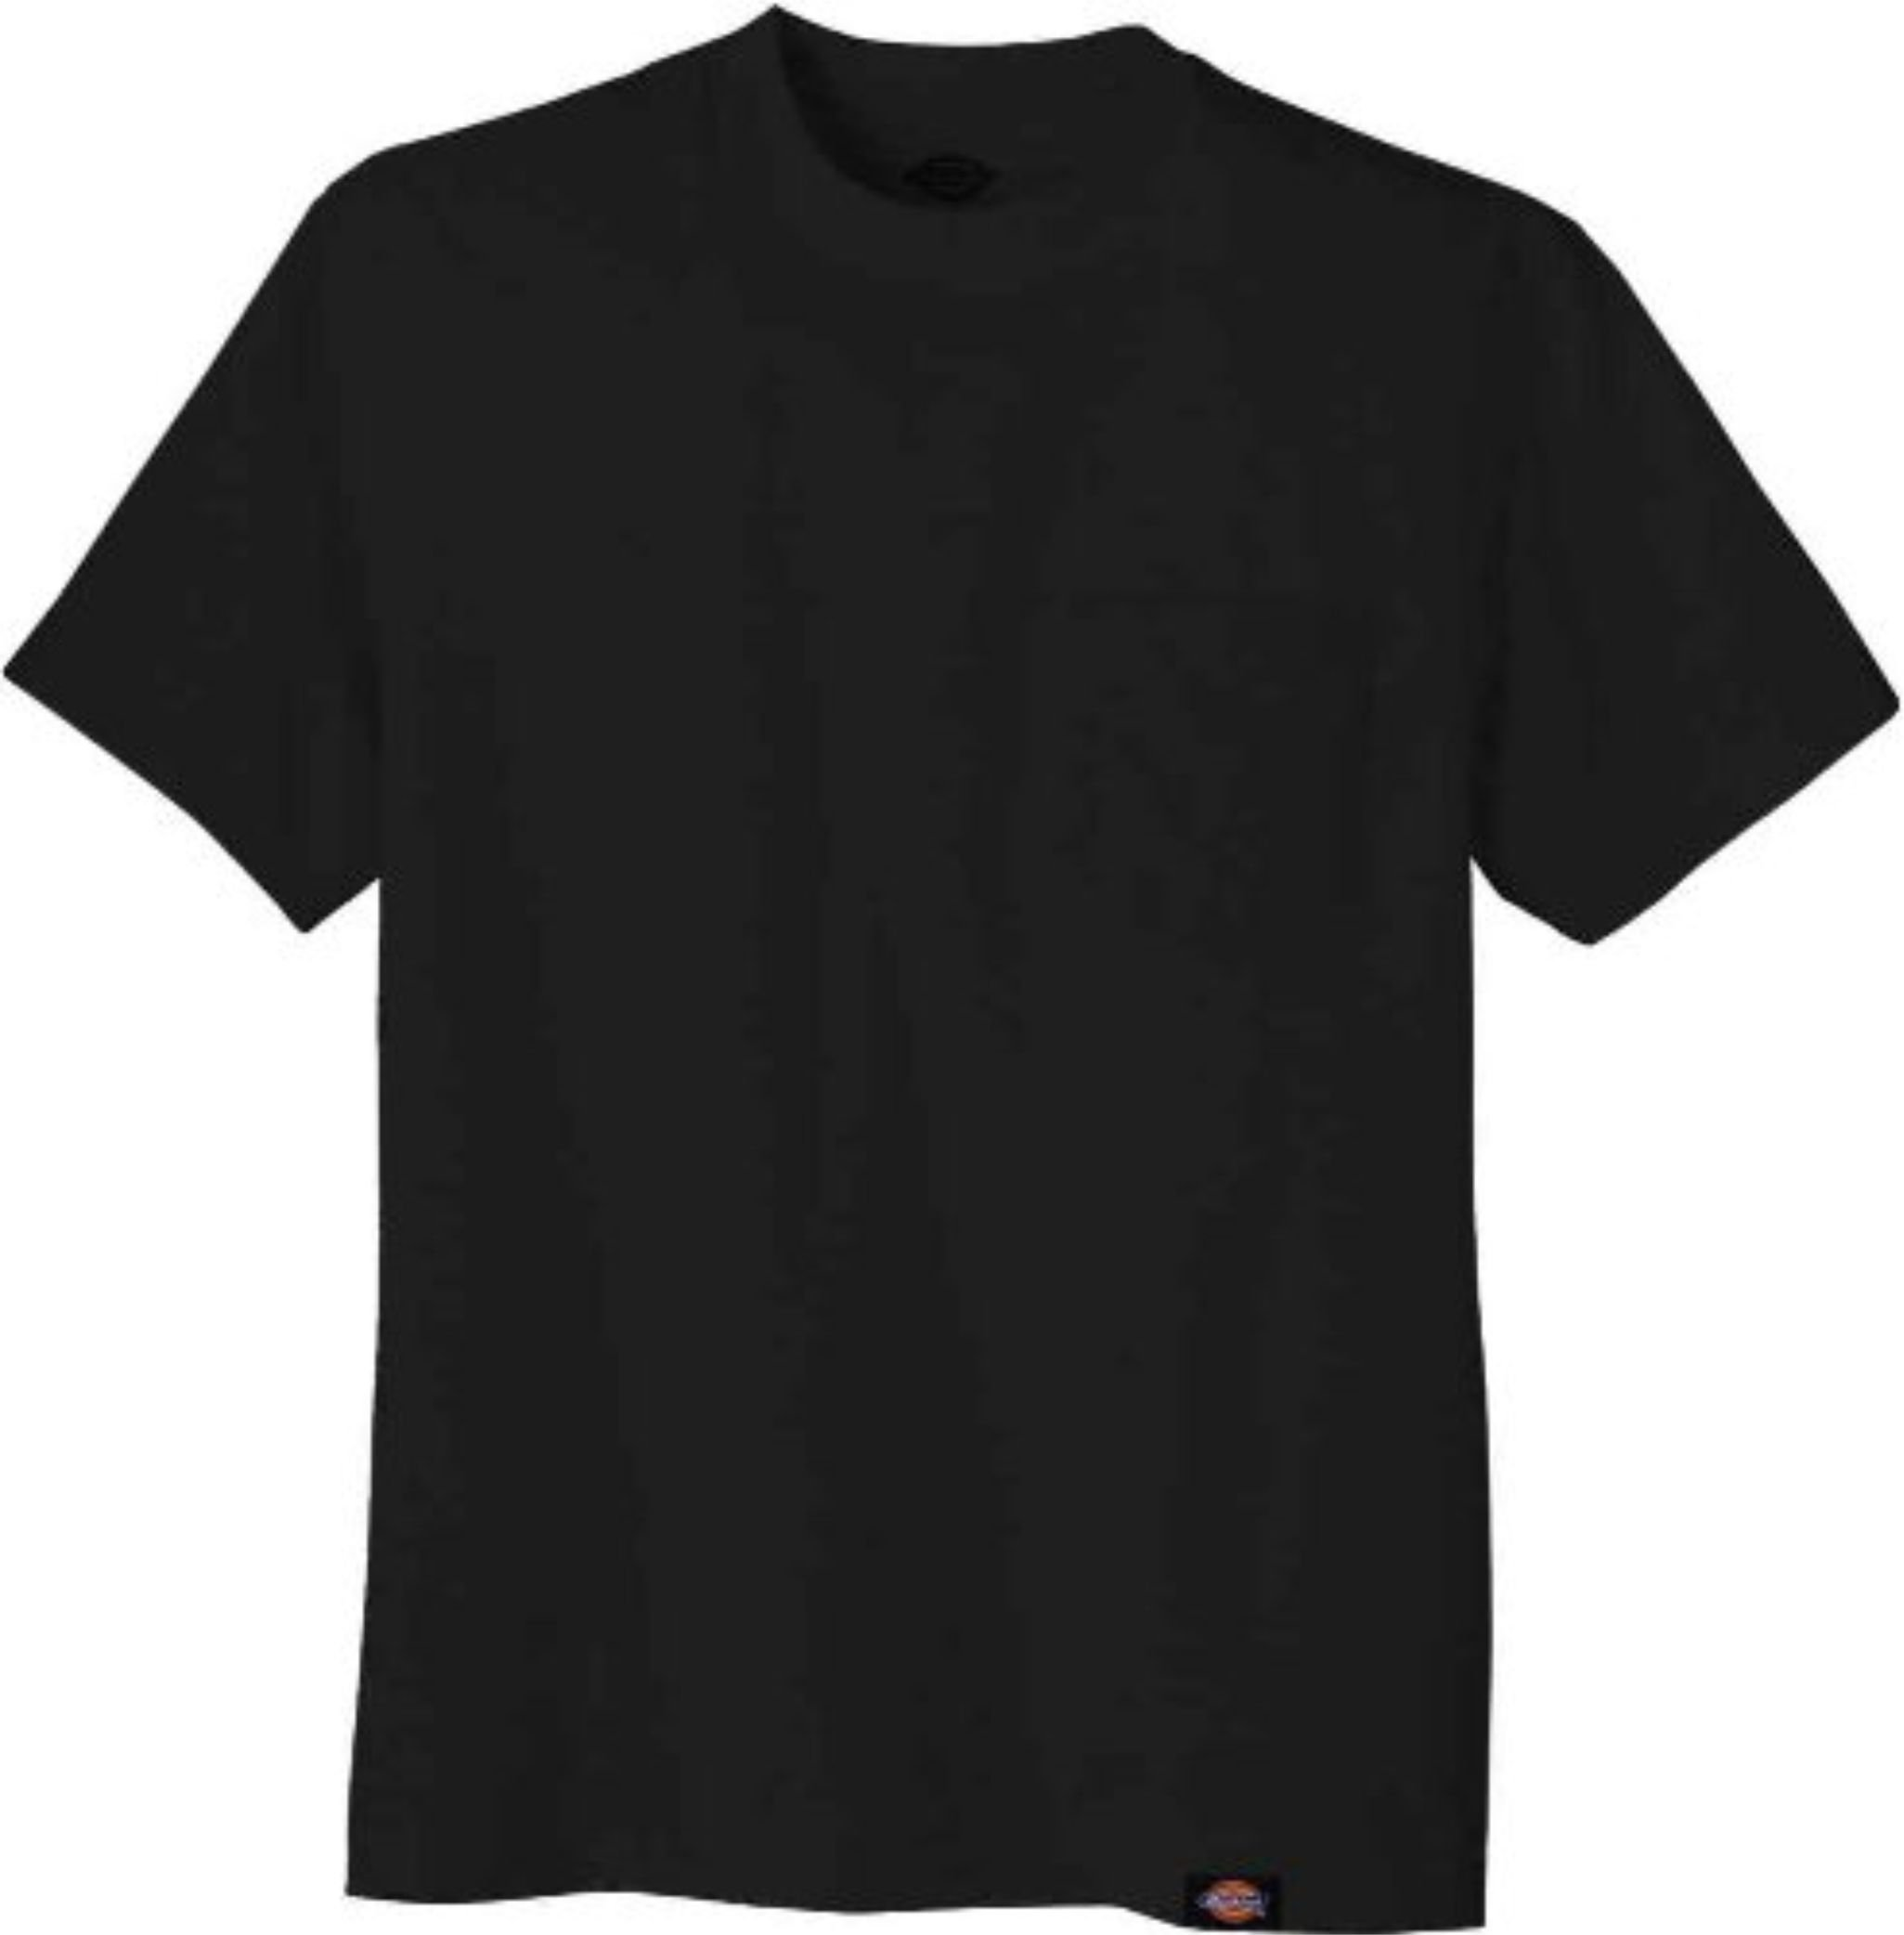 Dickies Men's Short-Sleeve Pocket T-Shirt Black,3X